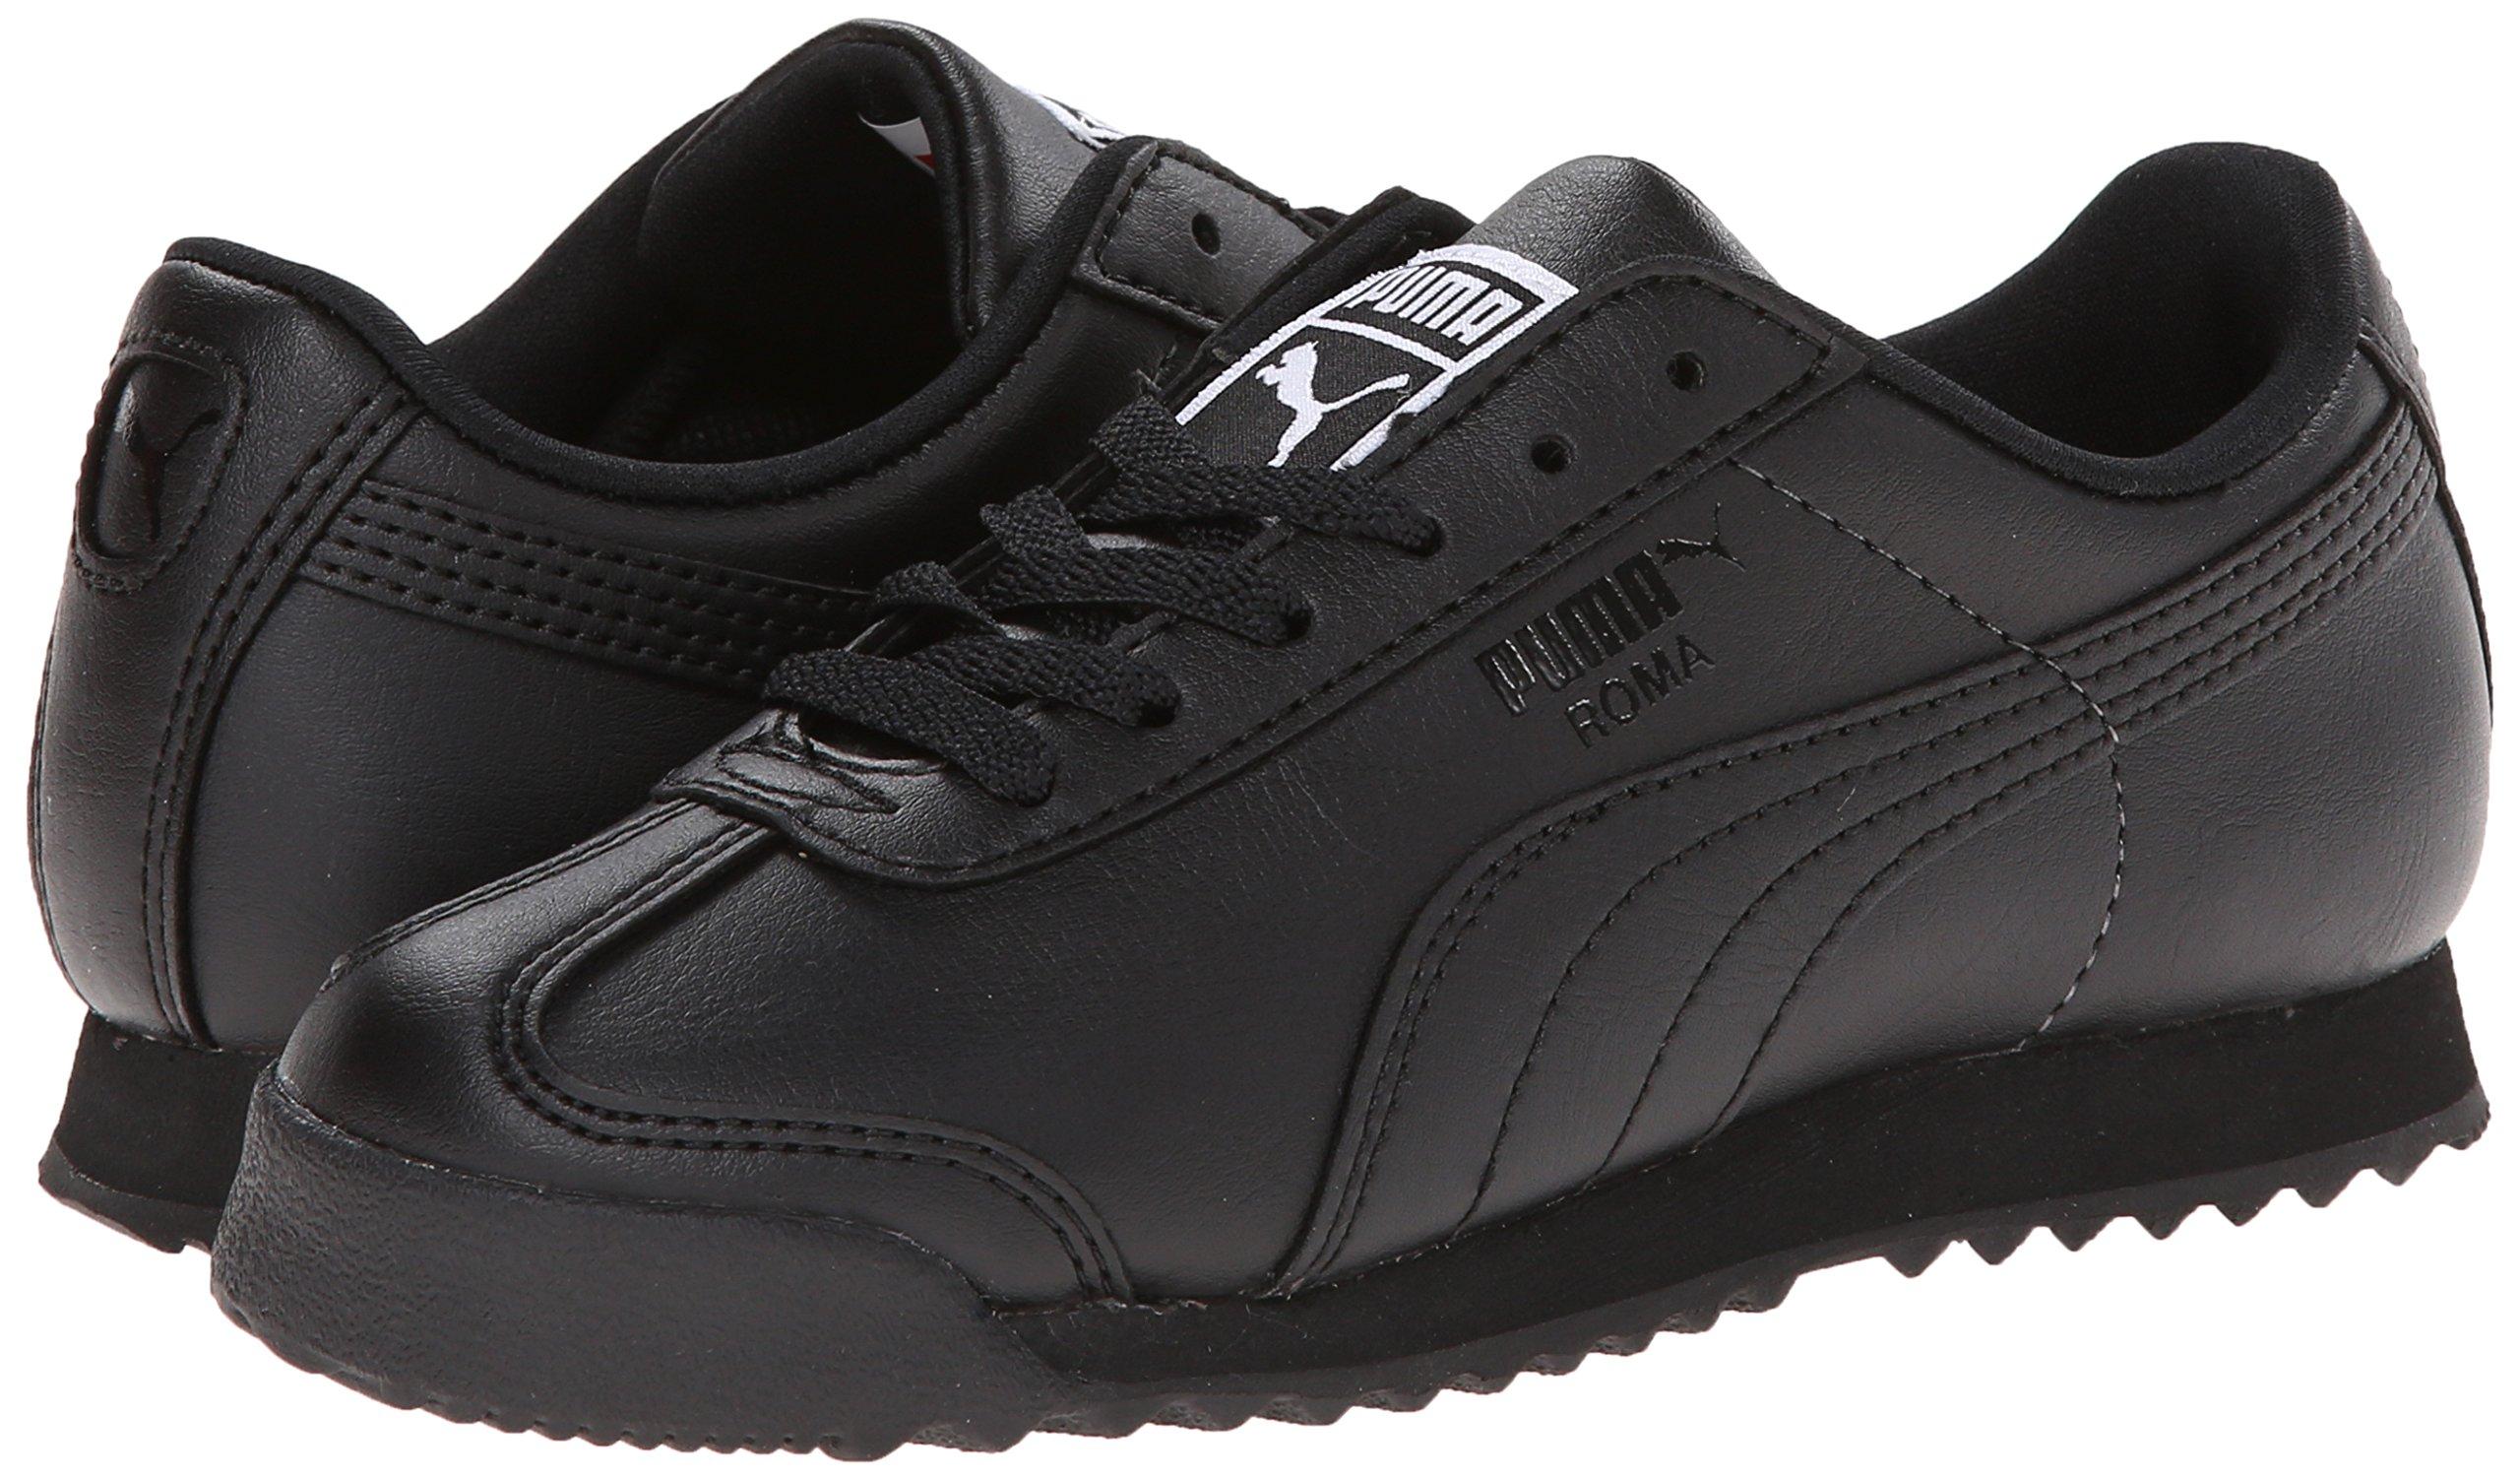 PUMA Roma Basic JR Sneaker , Black/Black, 1 M US Little Kid by PUMA (Image #6)